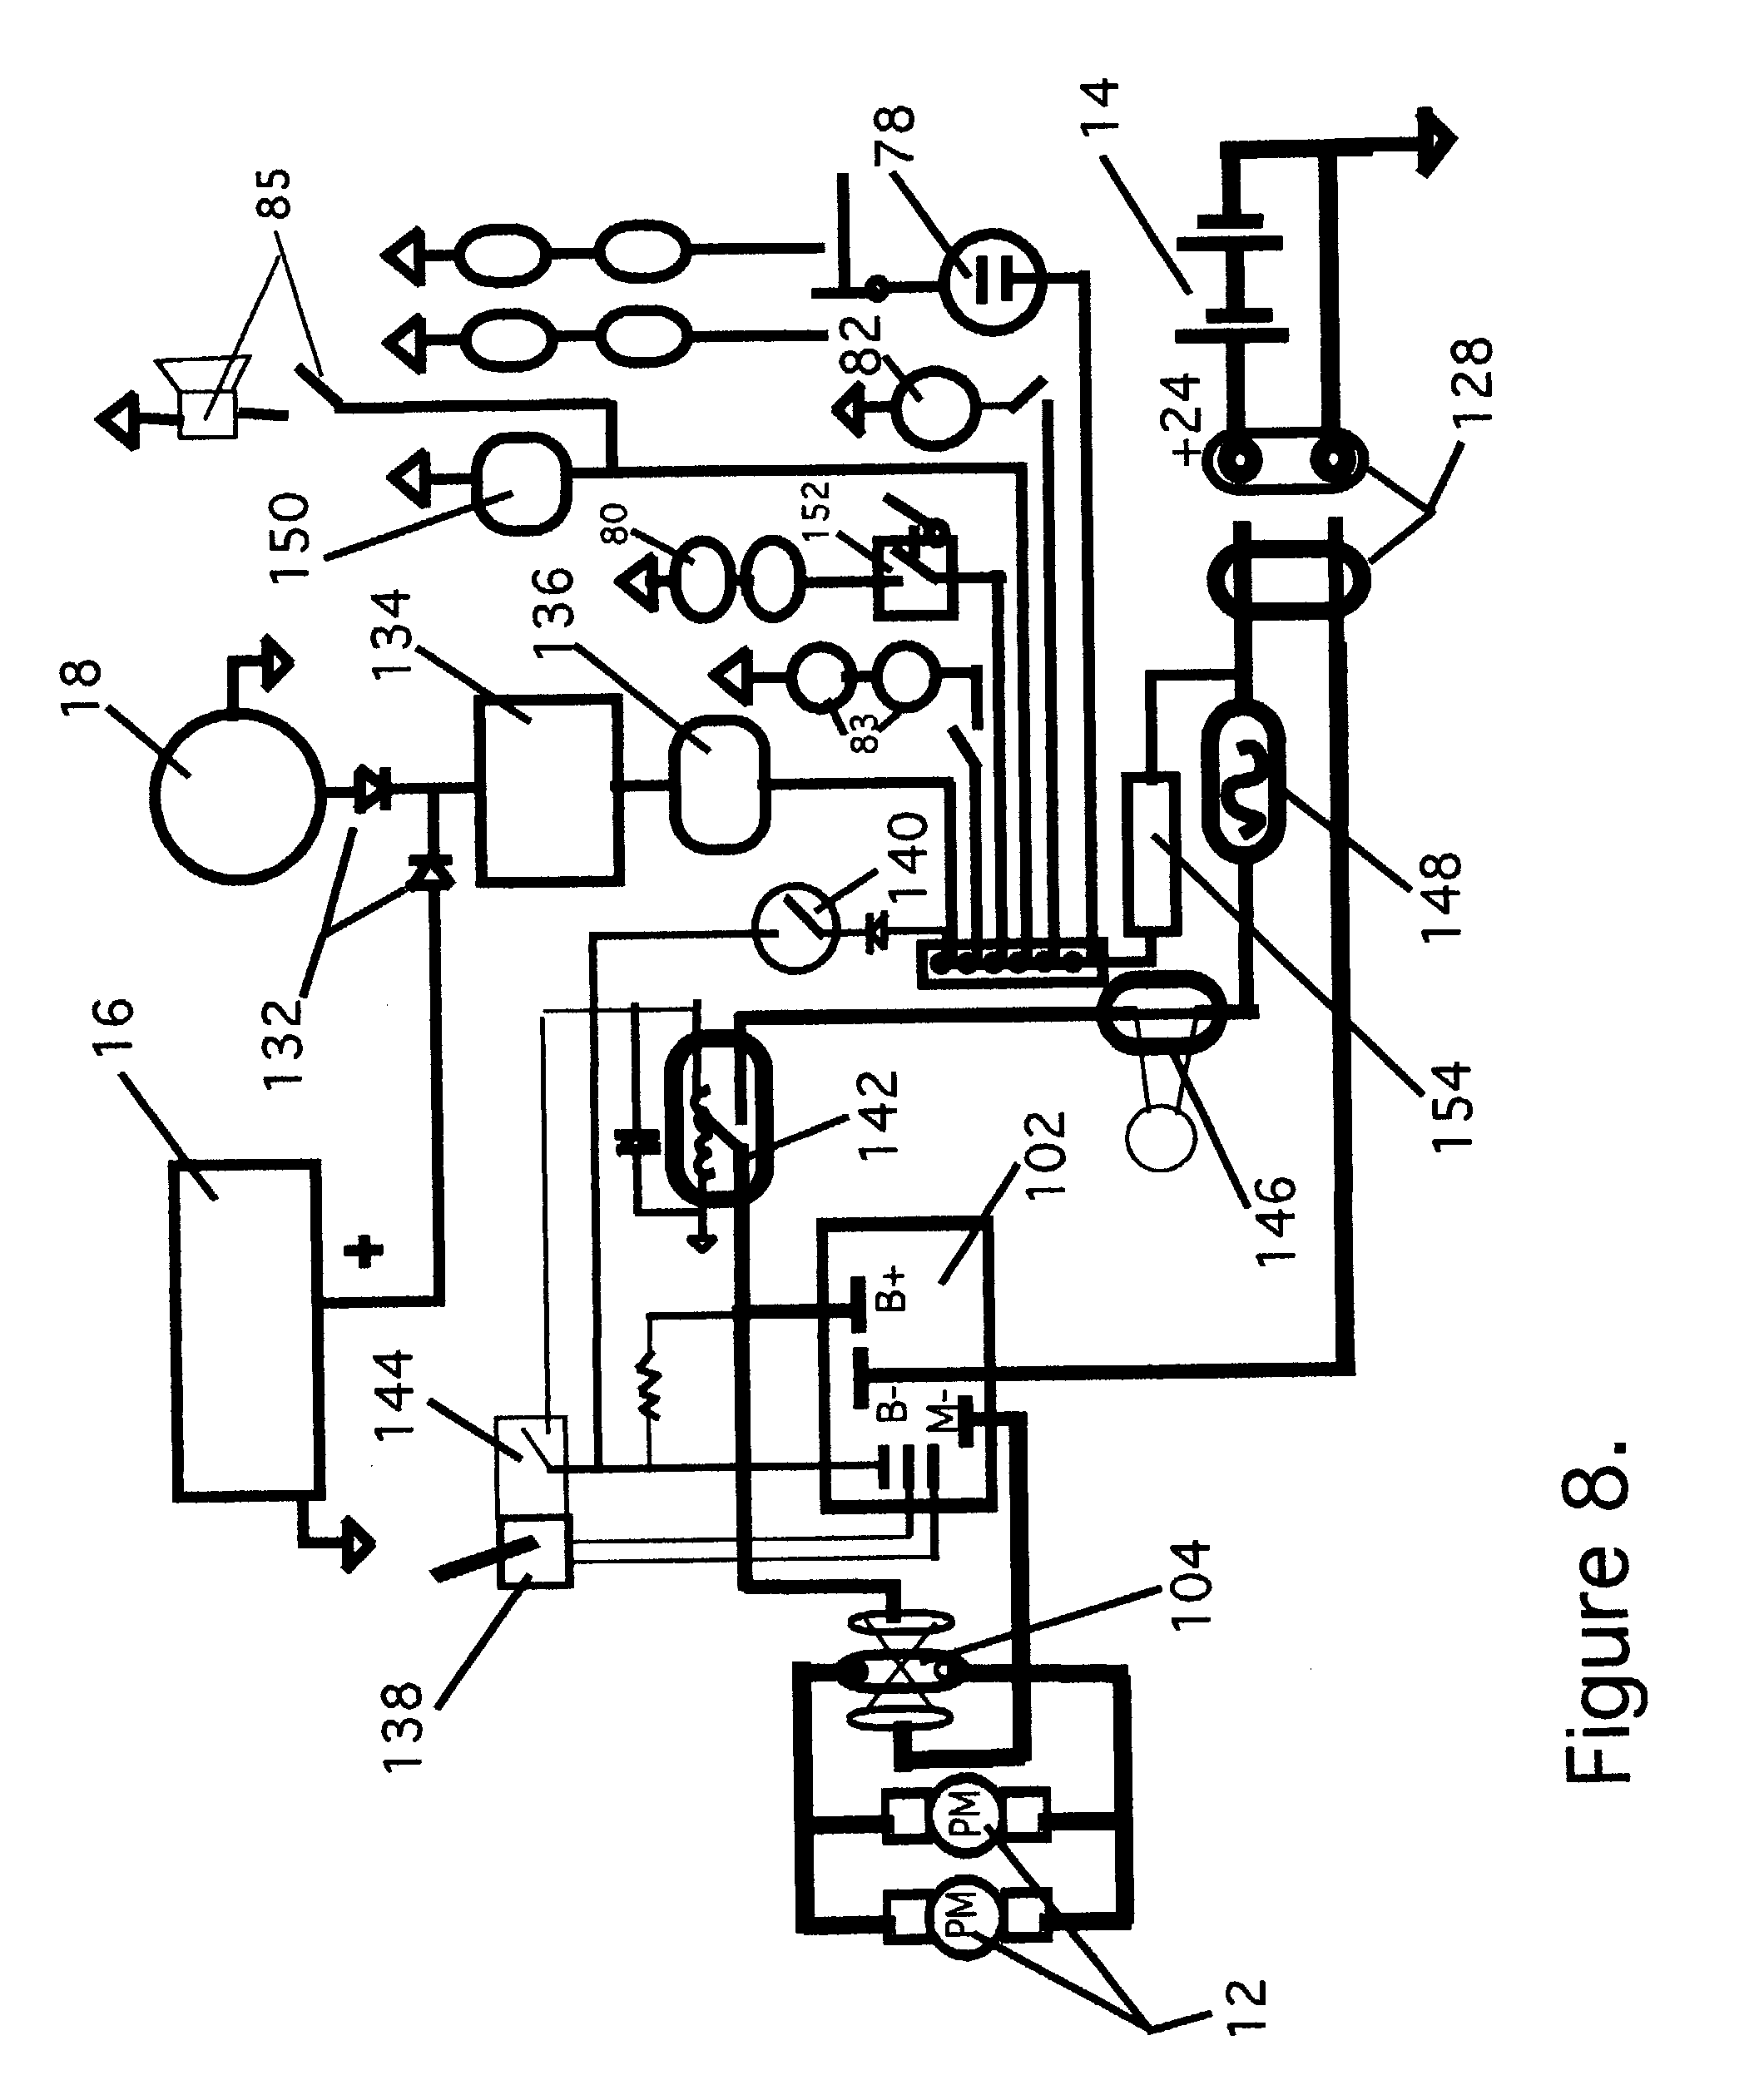 vdo voltmeter gauge wiring diagram images vdo gauge wiring diagram moreover solar battery wiring diagrams as